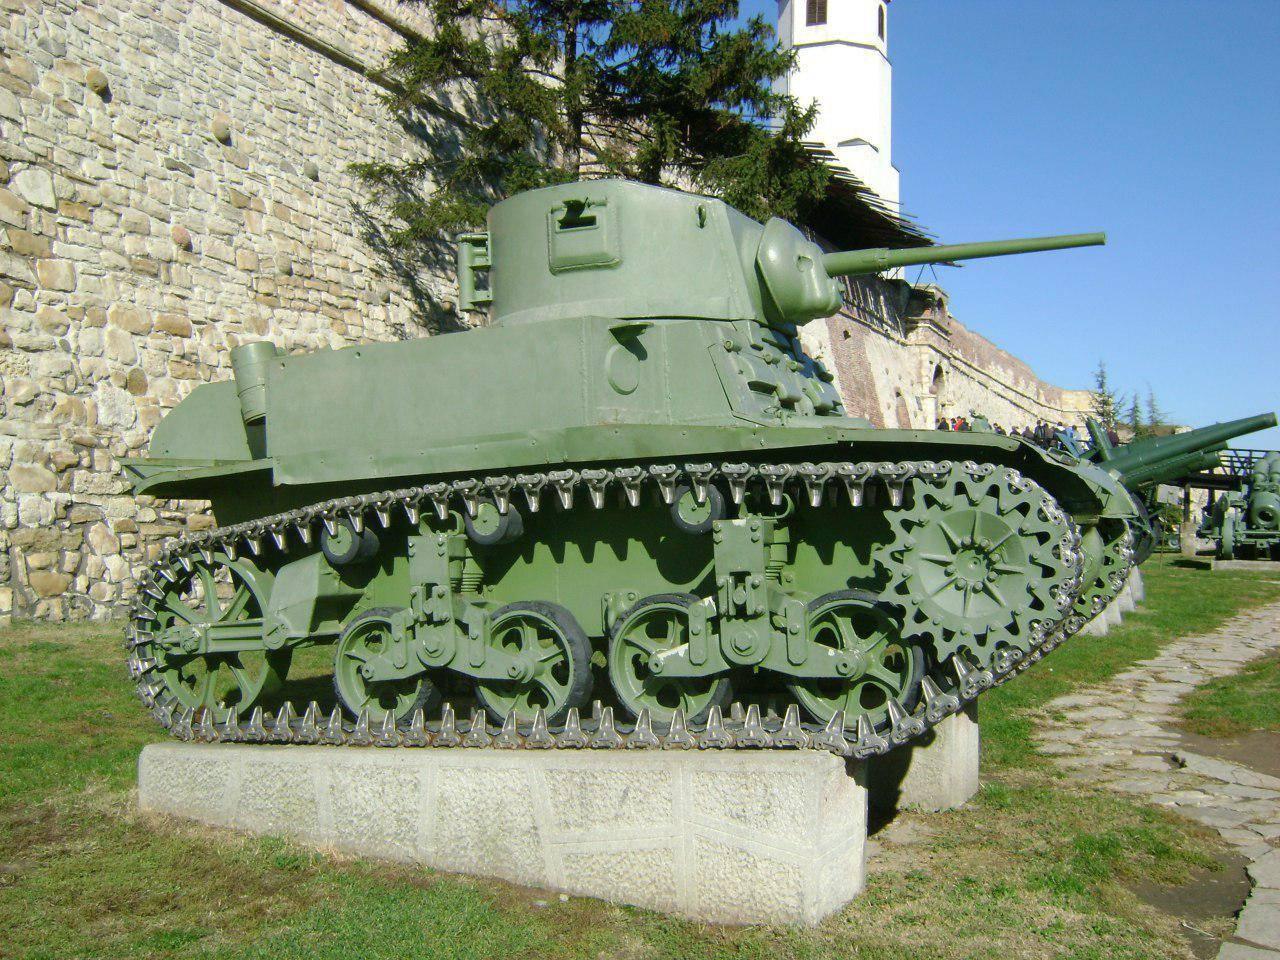 Сербский танк у стен крепости Калемегдан в Белграде